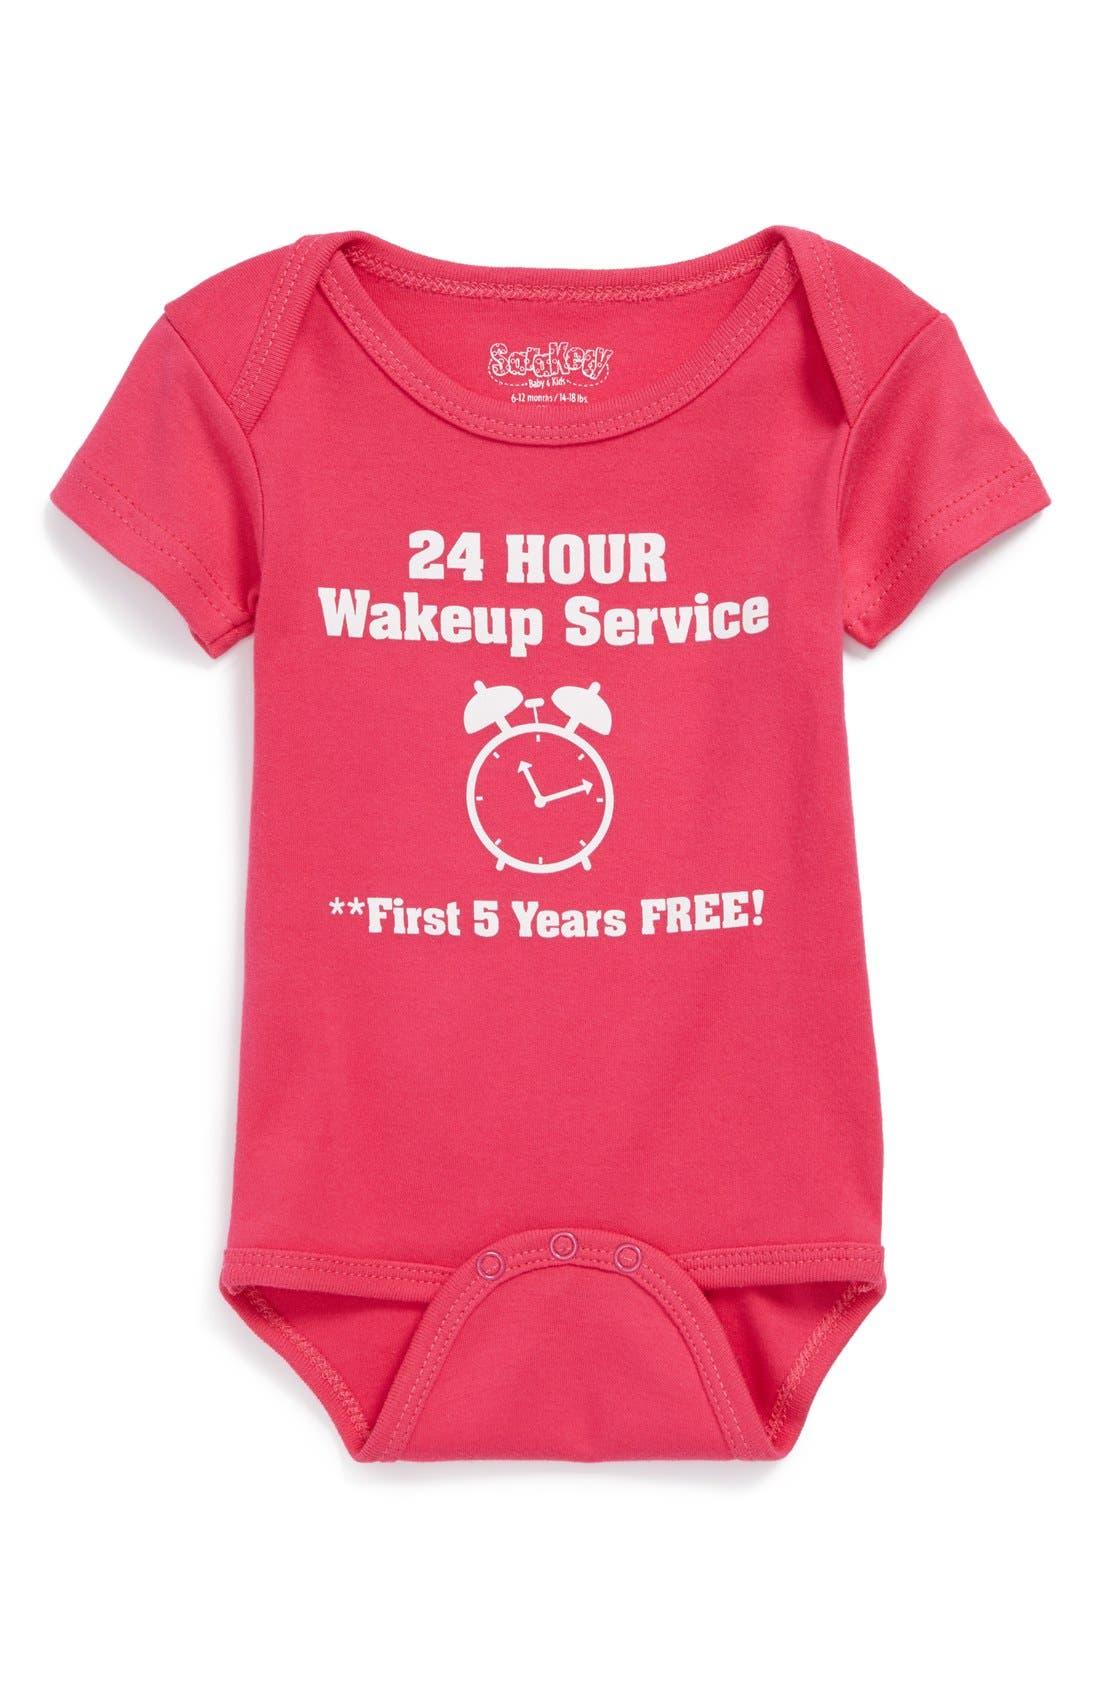 SARA KETY BABY & KIDS, 'Wakeup Service' Bodysuit, Main thumbnail 1, color, 674